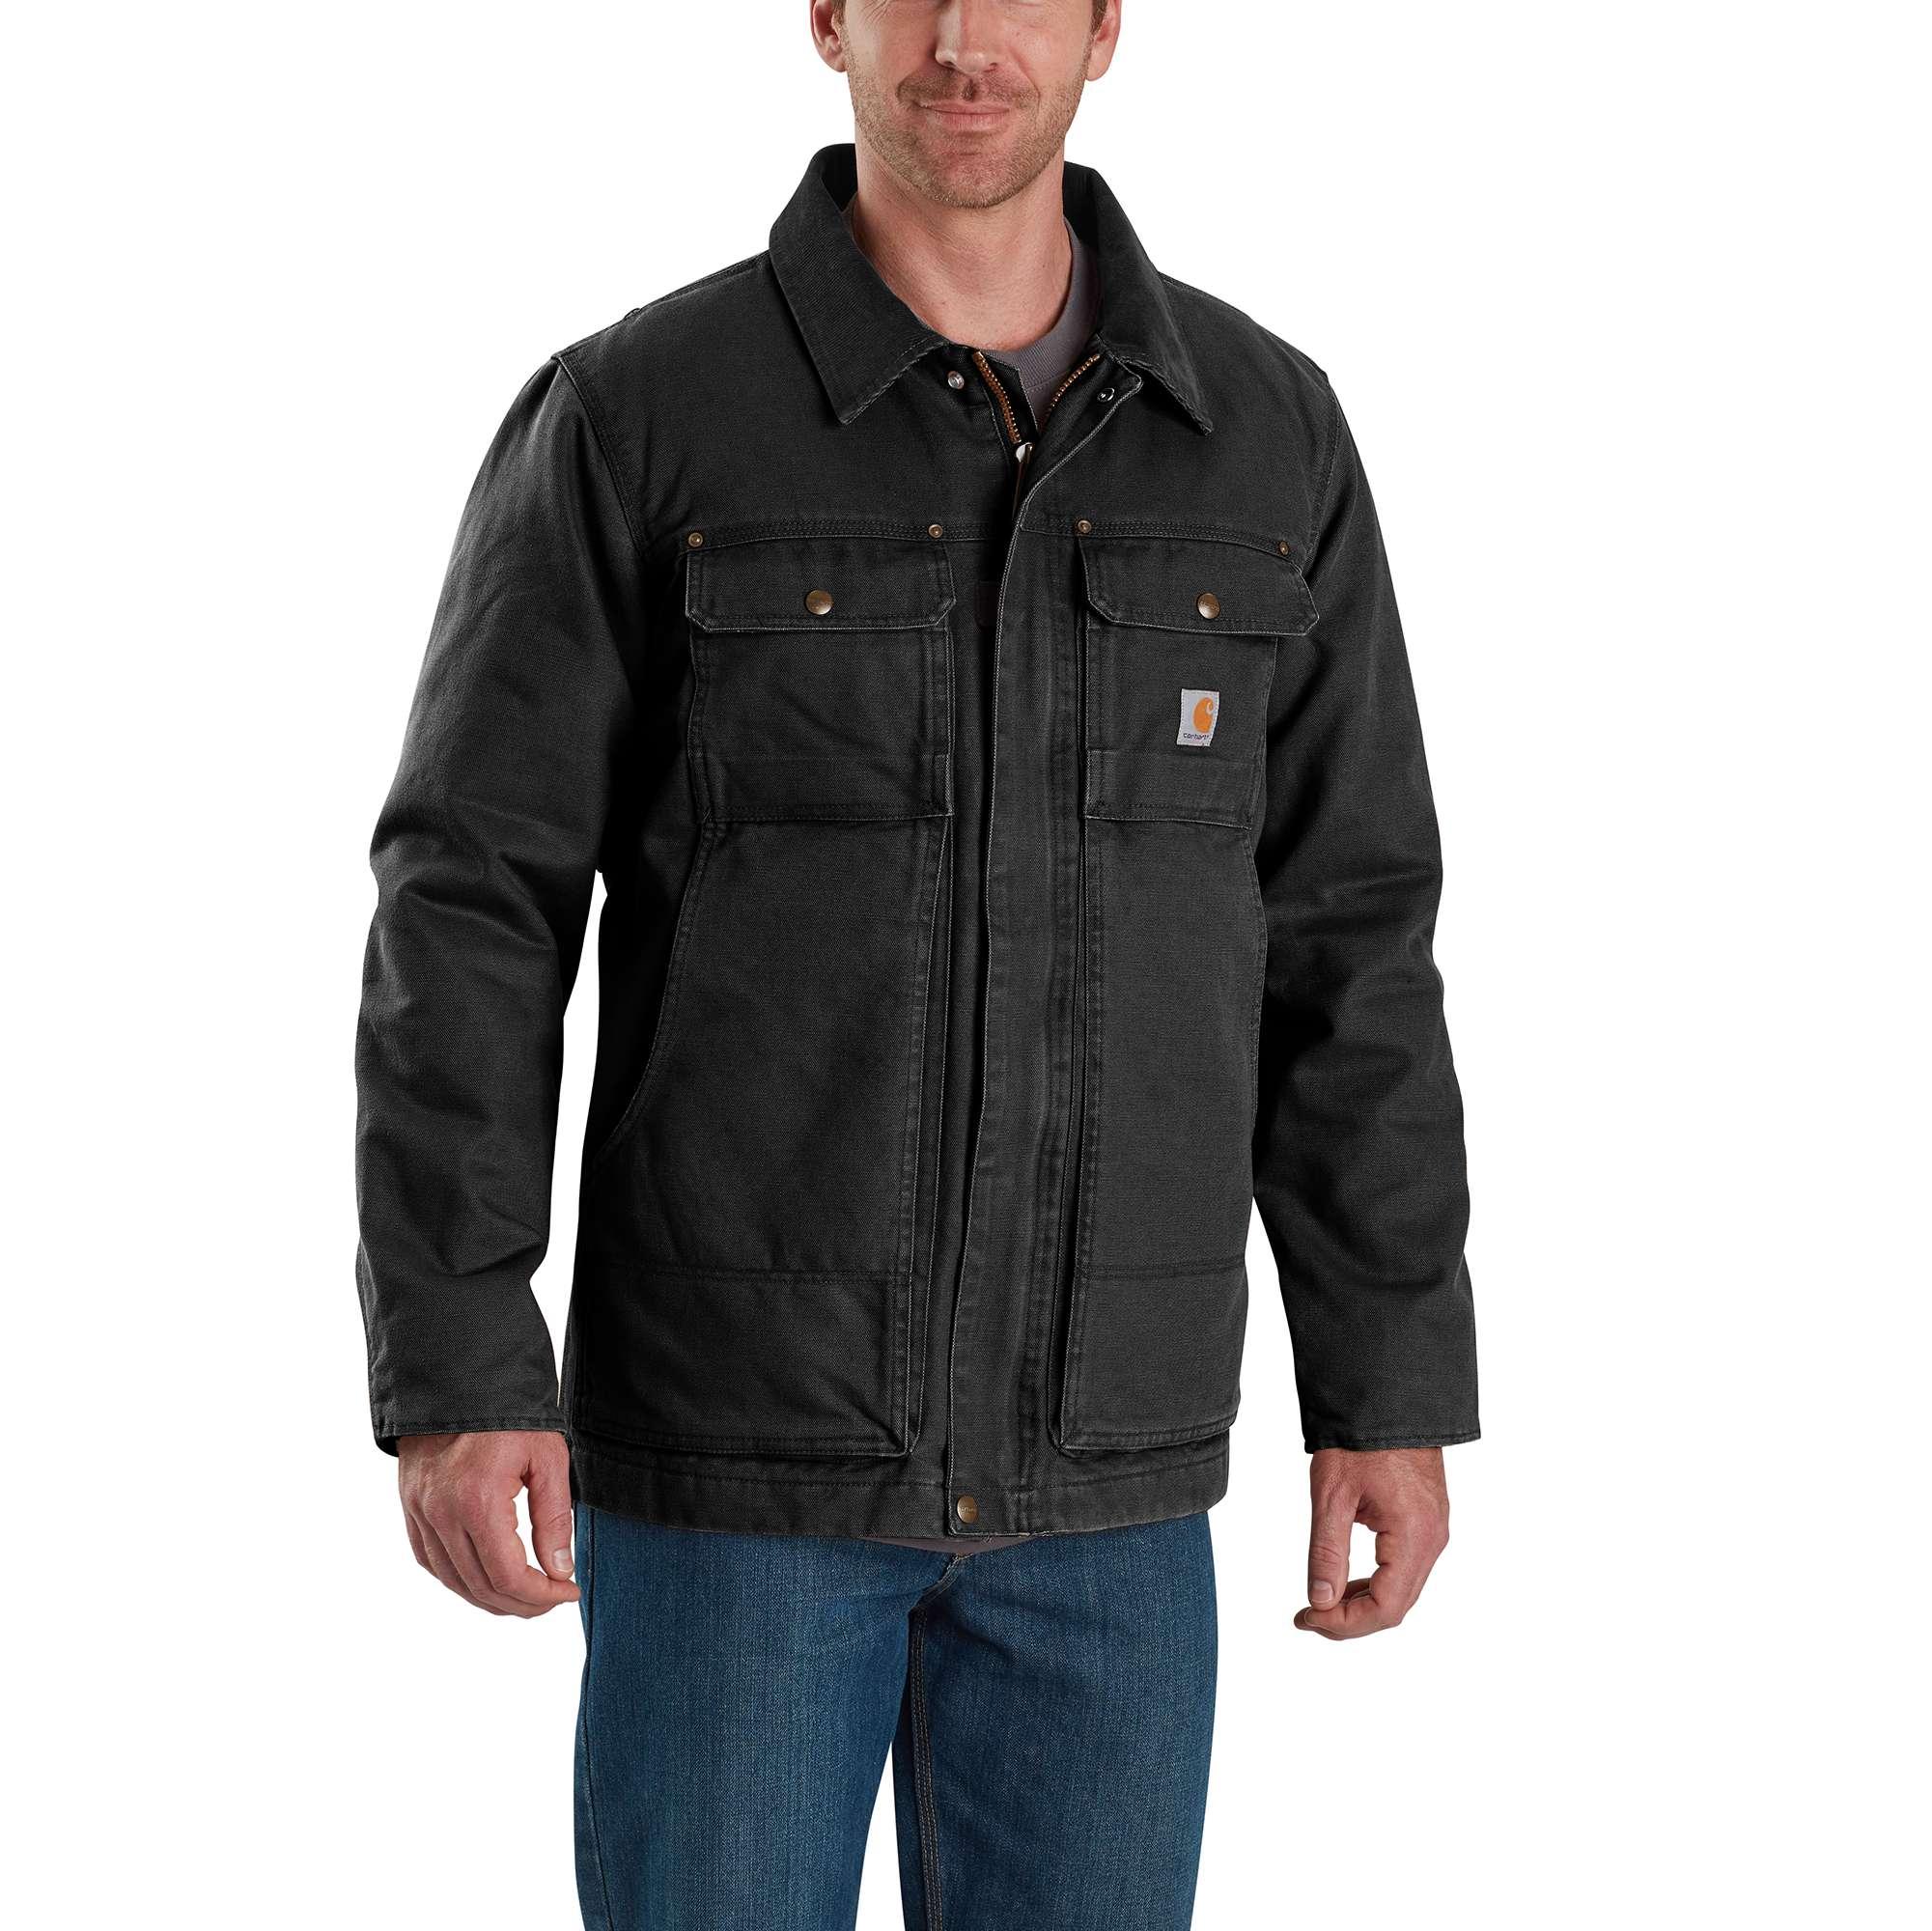 fe454cff7d54 Men s Full Swing® Armstrong Traditional Coat 103283